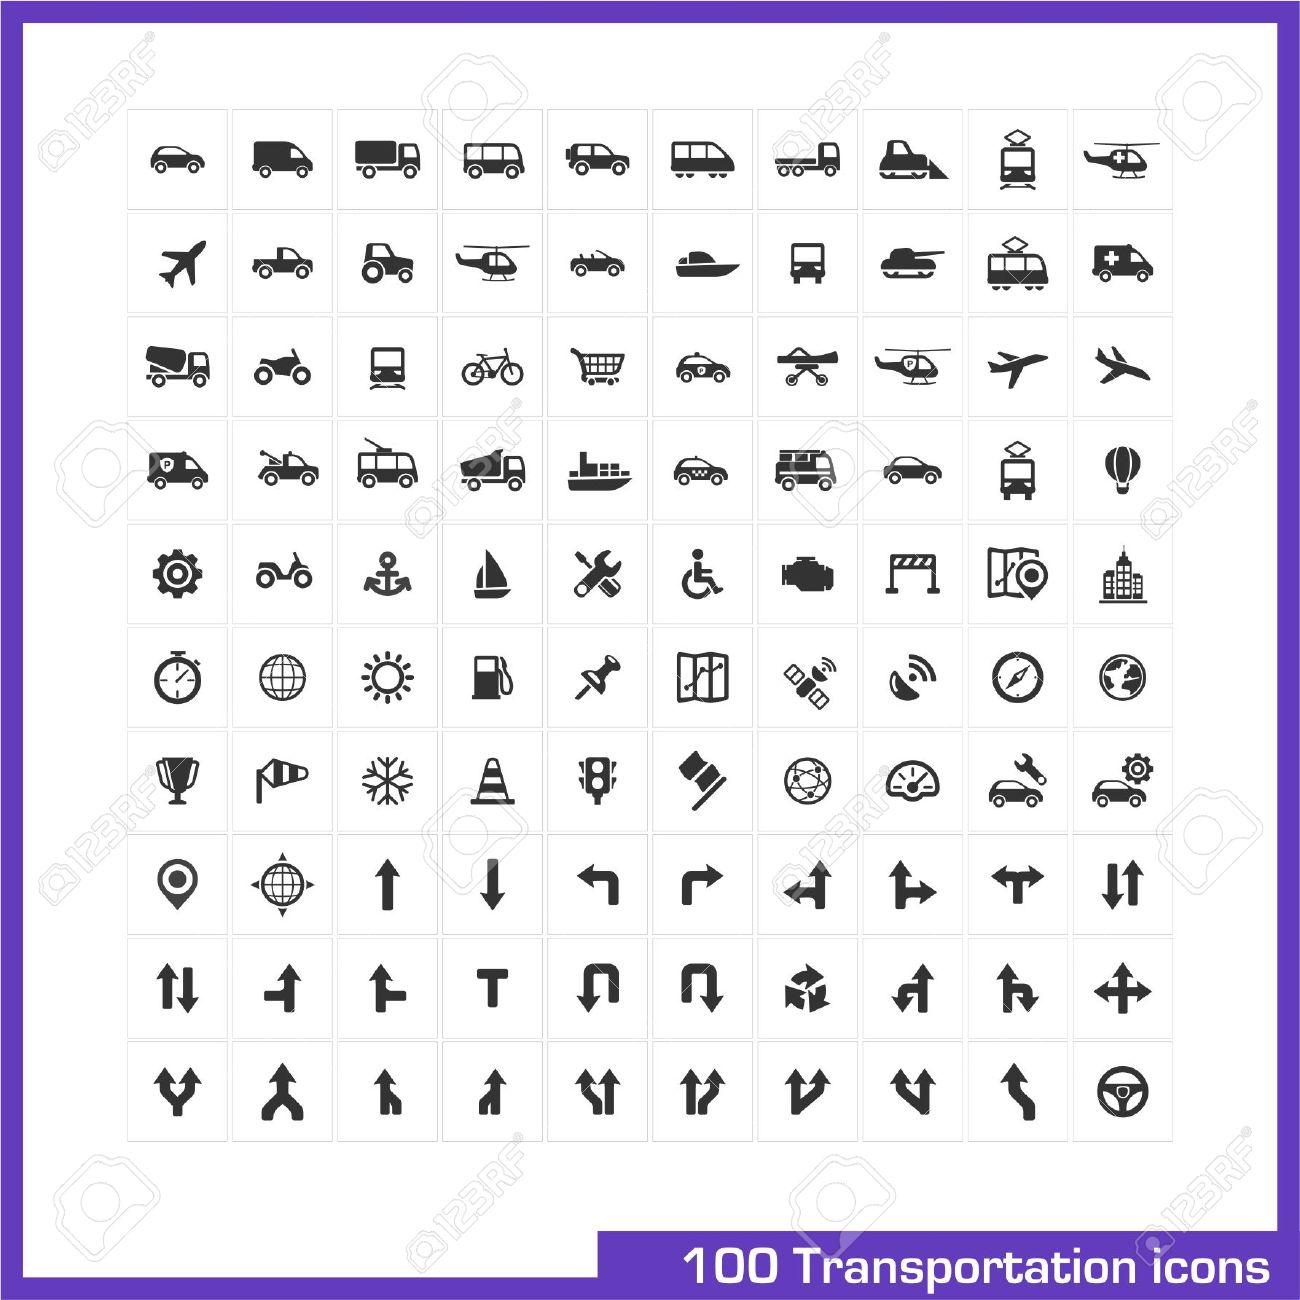 100 transportation icons set vector black pictograms for business 100 transportation icons set vector black pictograms for business industry navigation web biocorpaavc